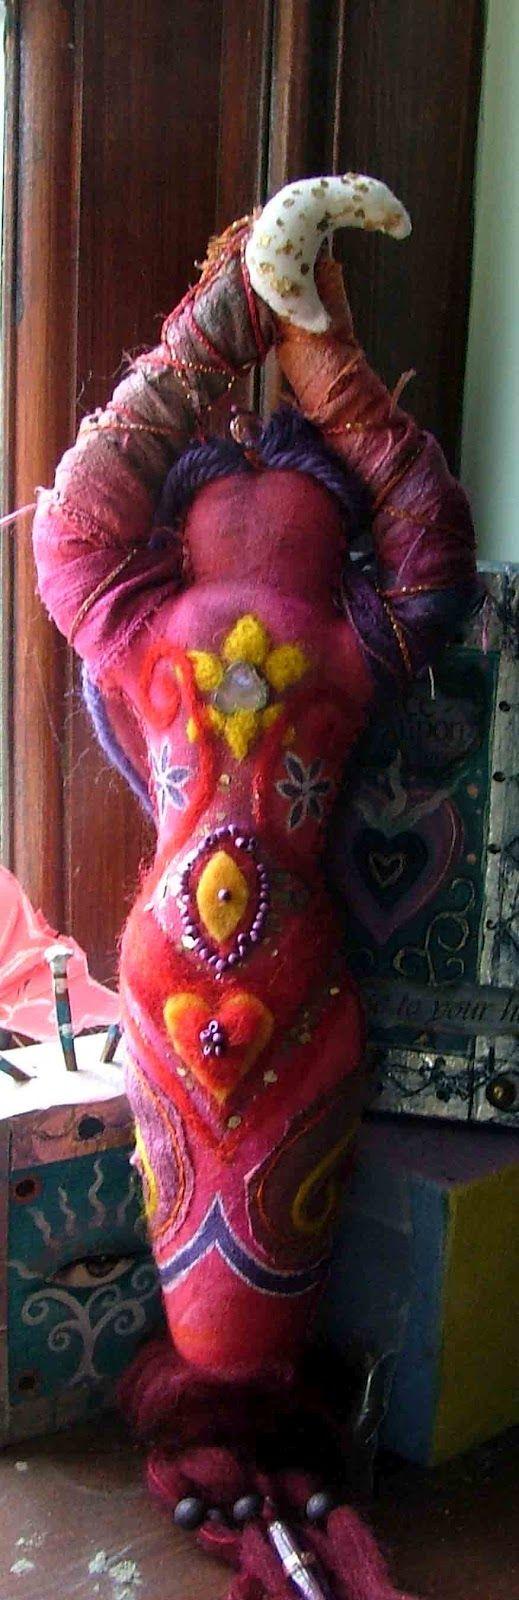 spirit dolls   spirit+dolls+by+Amanda+Clark+038.jpg